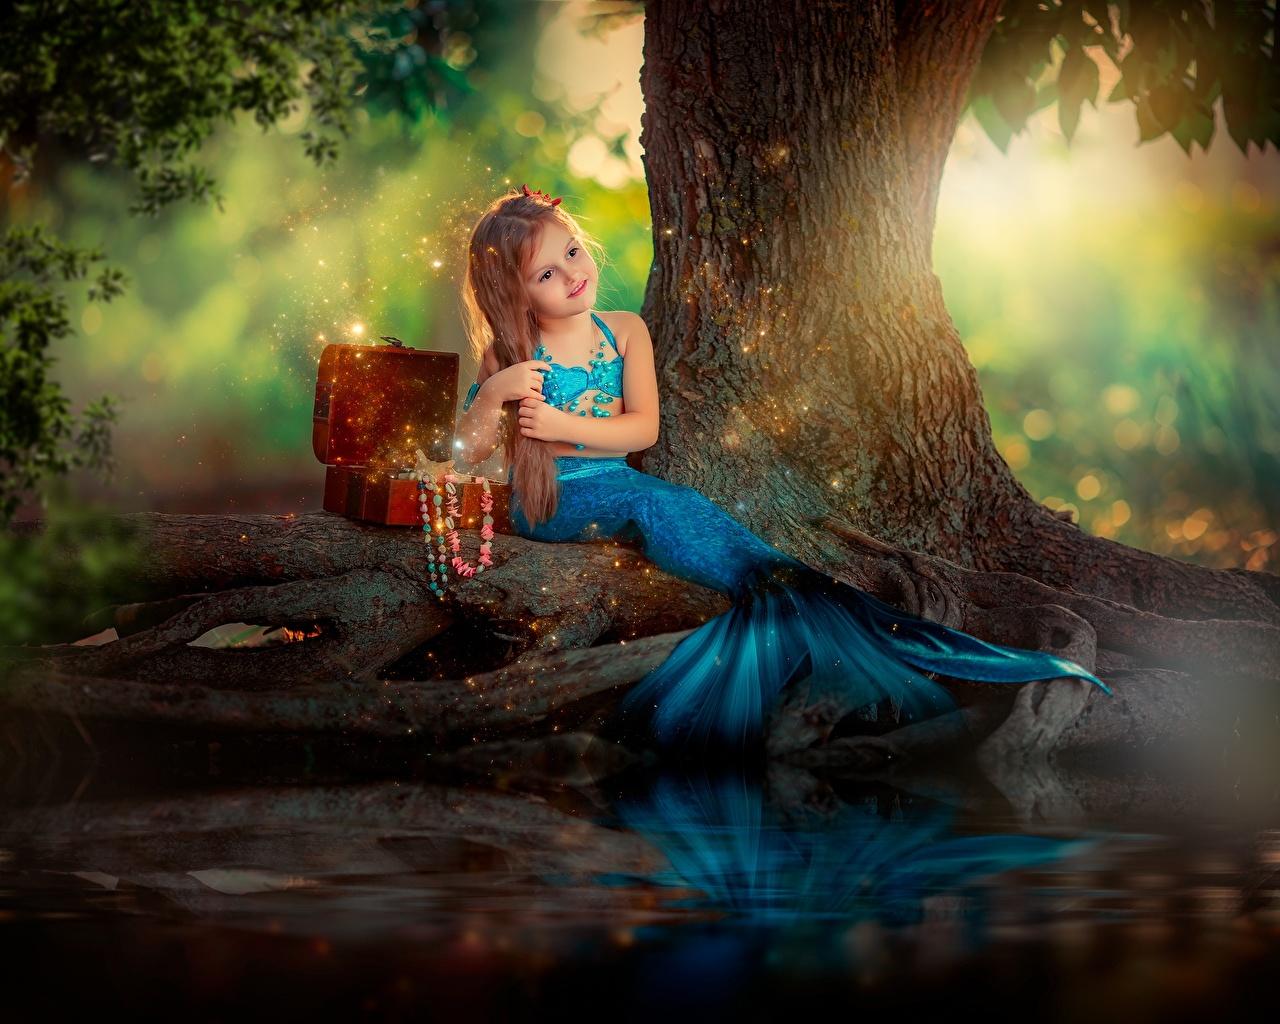 Фотографии Девочки Русалки Сундук сокровищ ребёнок сидящие девочка русалка Клад Дети сидя Сидит